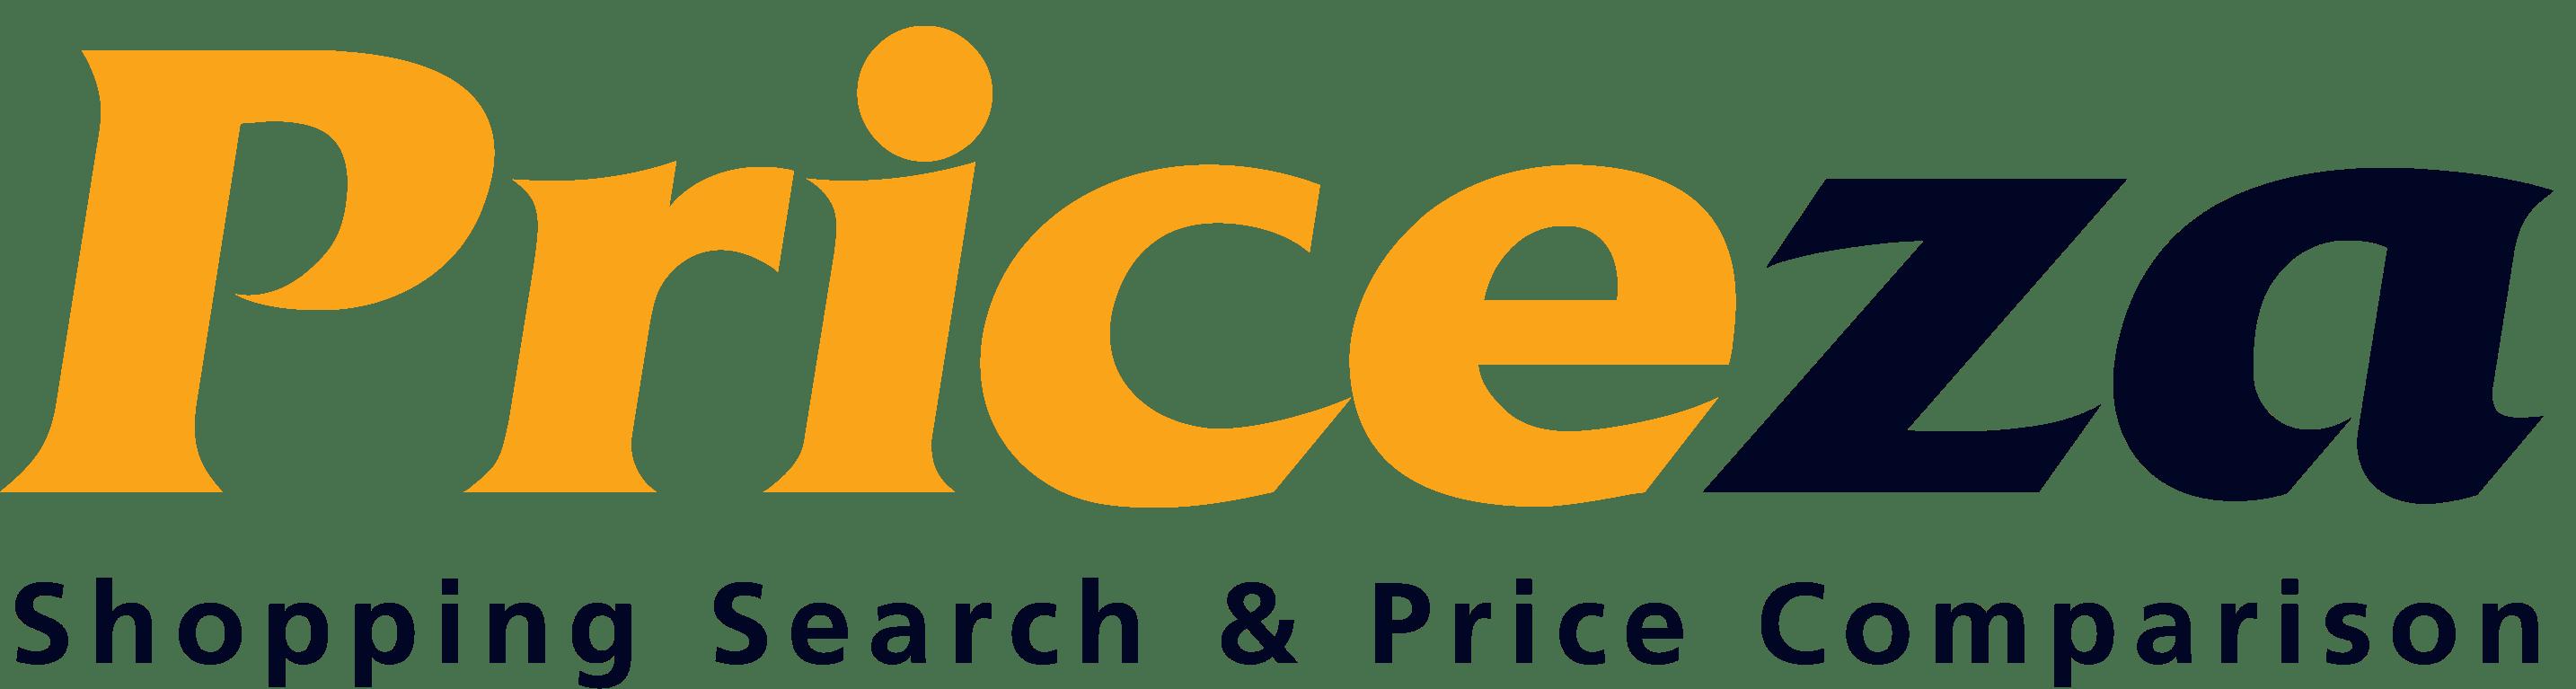 Priceza Logo